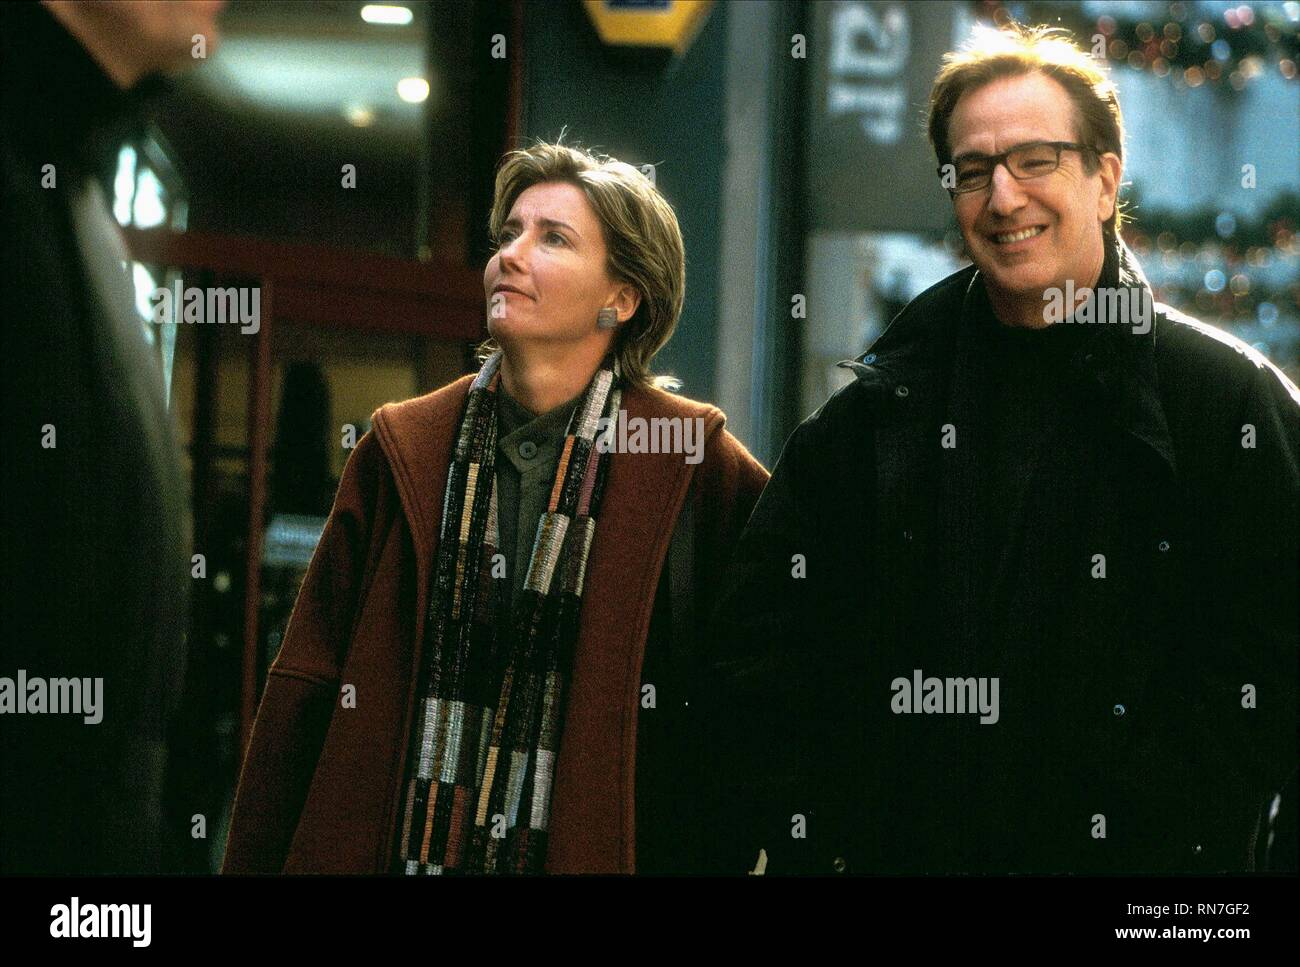 THOMPSON,RICKMAN, LOVE ACTUALLY, 2003 - Stock Image